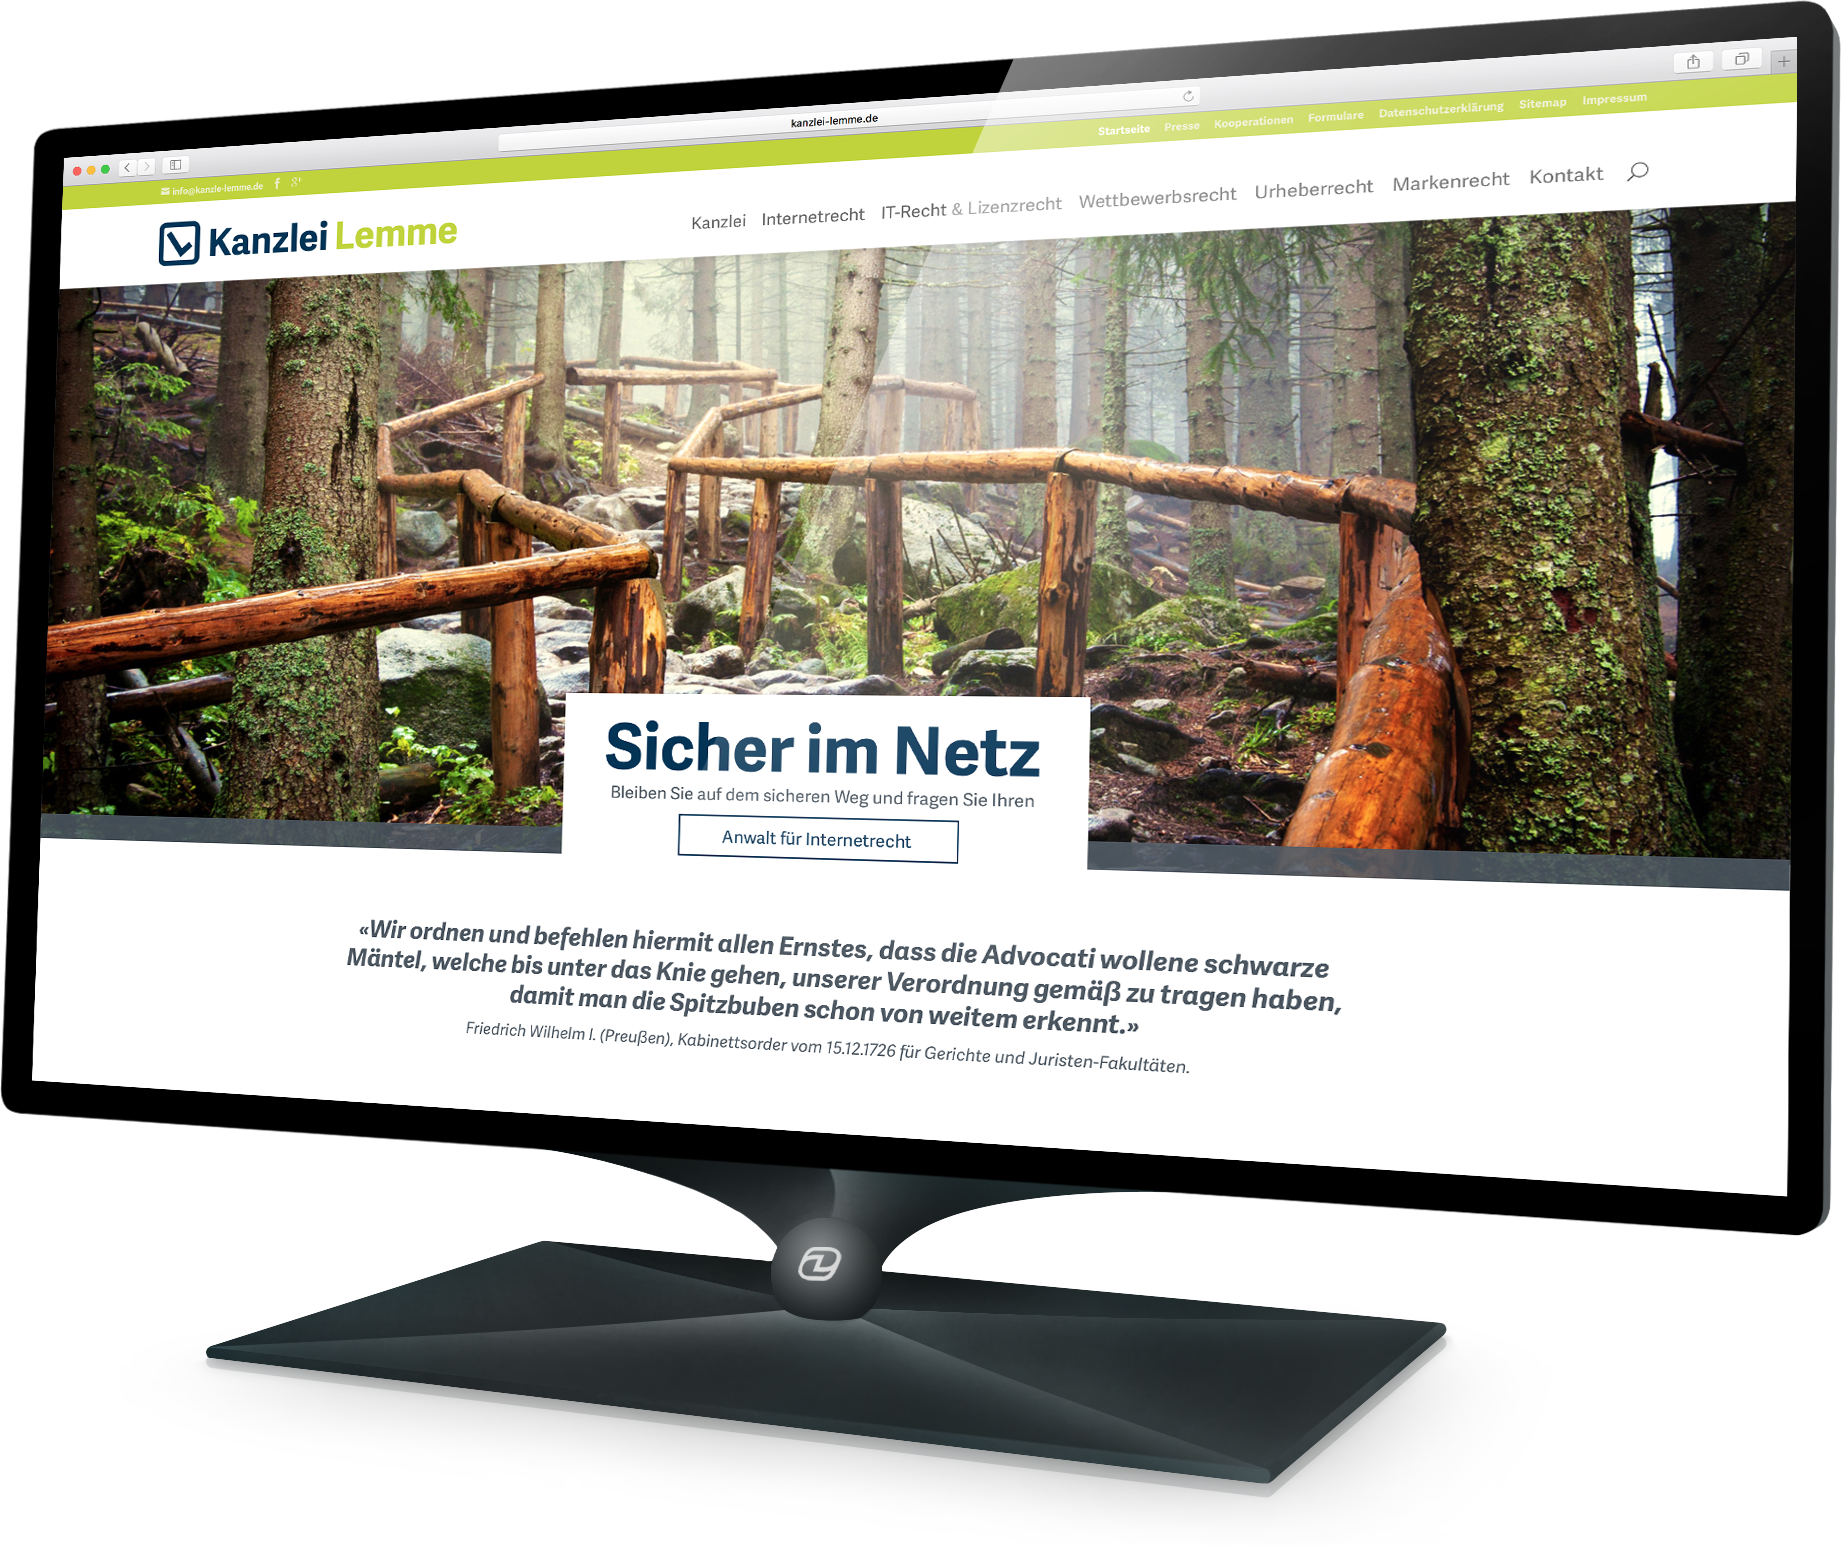 Webdesign Kanzlei Lemme (Demski Design)